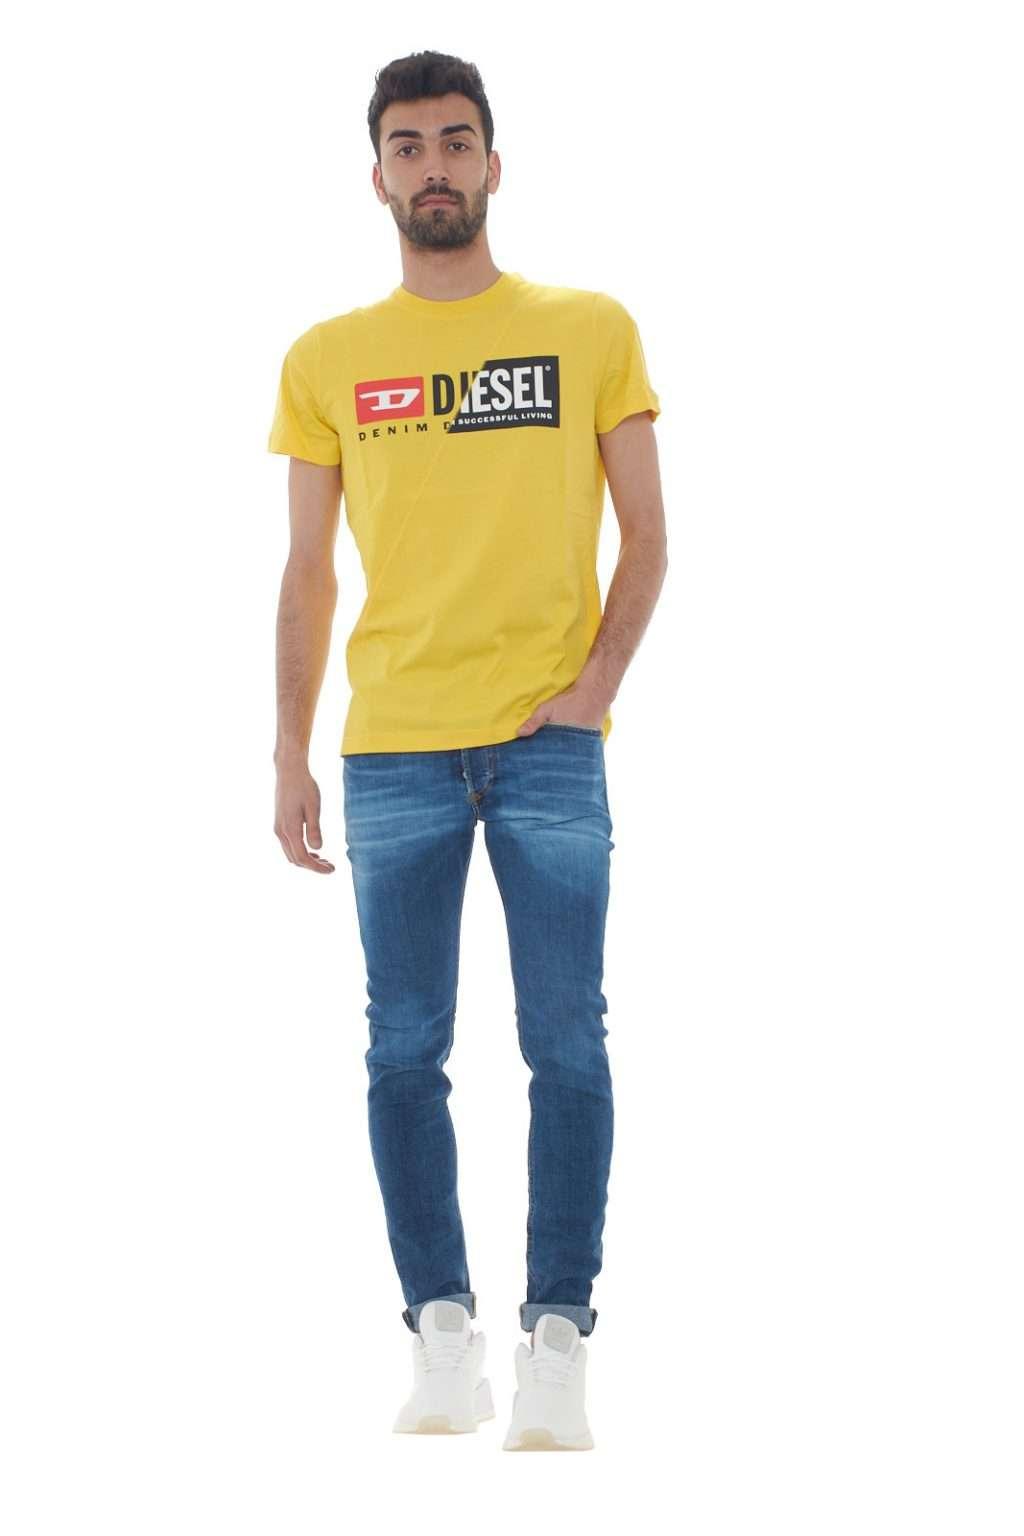 https://www.parmax.com/media/catalog/product/a/i/PE-outlet_parmax-t-shirt-uomo-Diesel-00SDP1%200091A-D.jpg